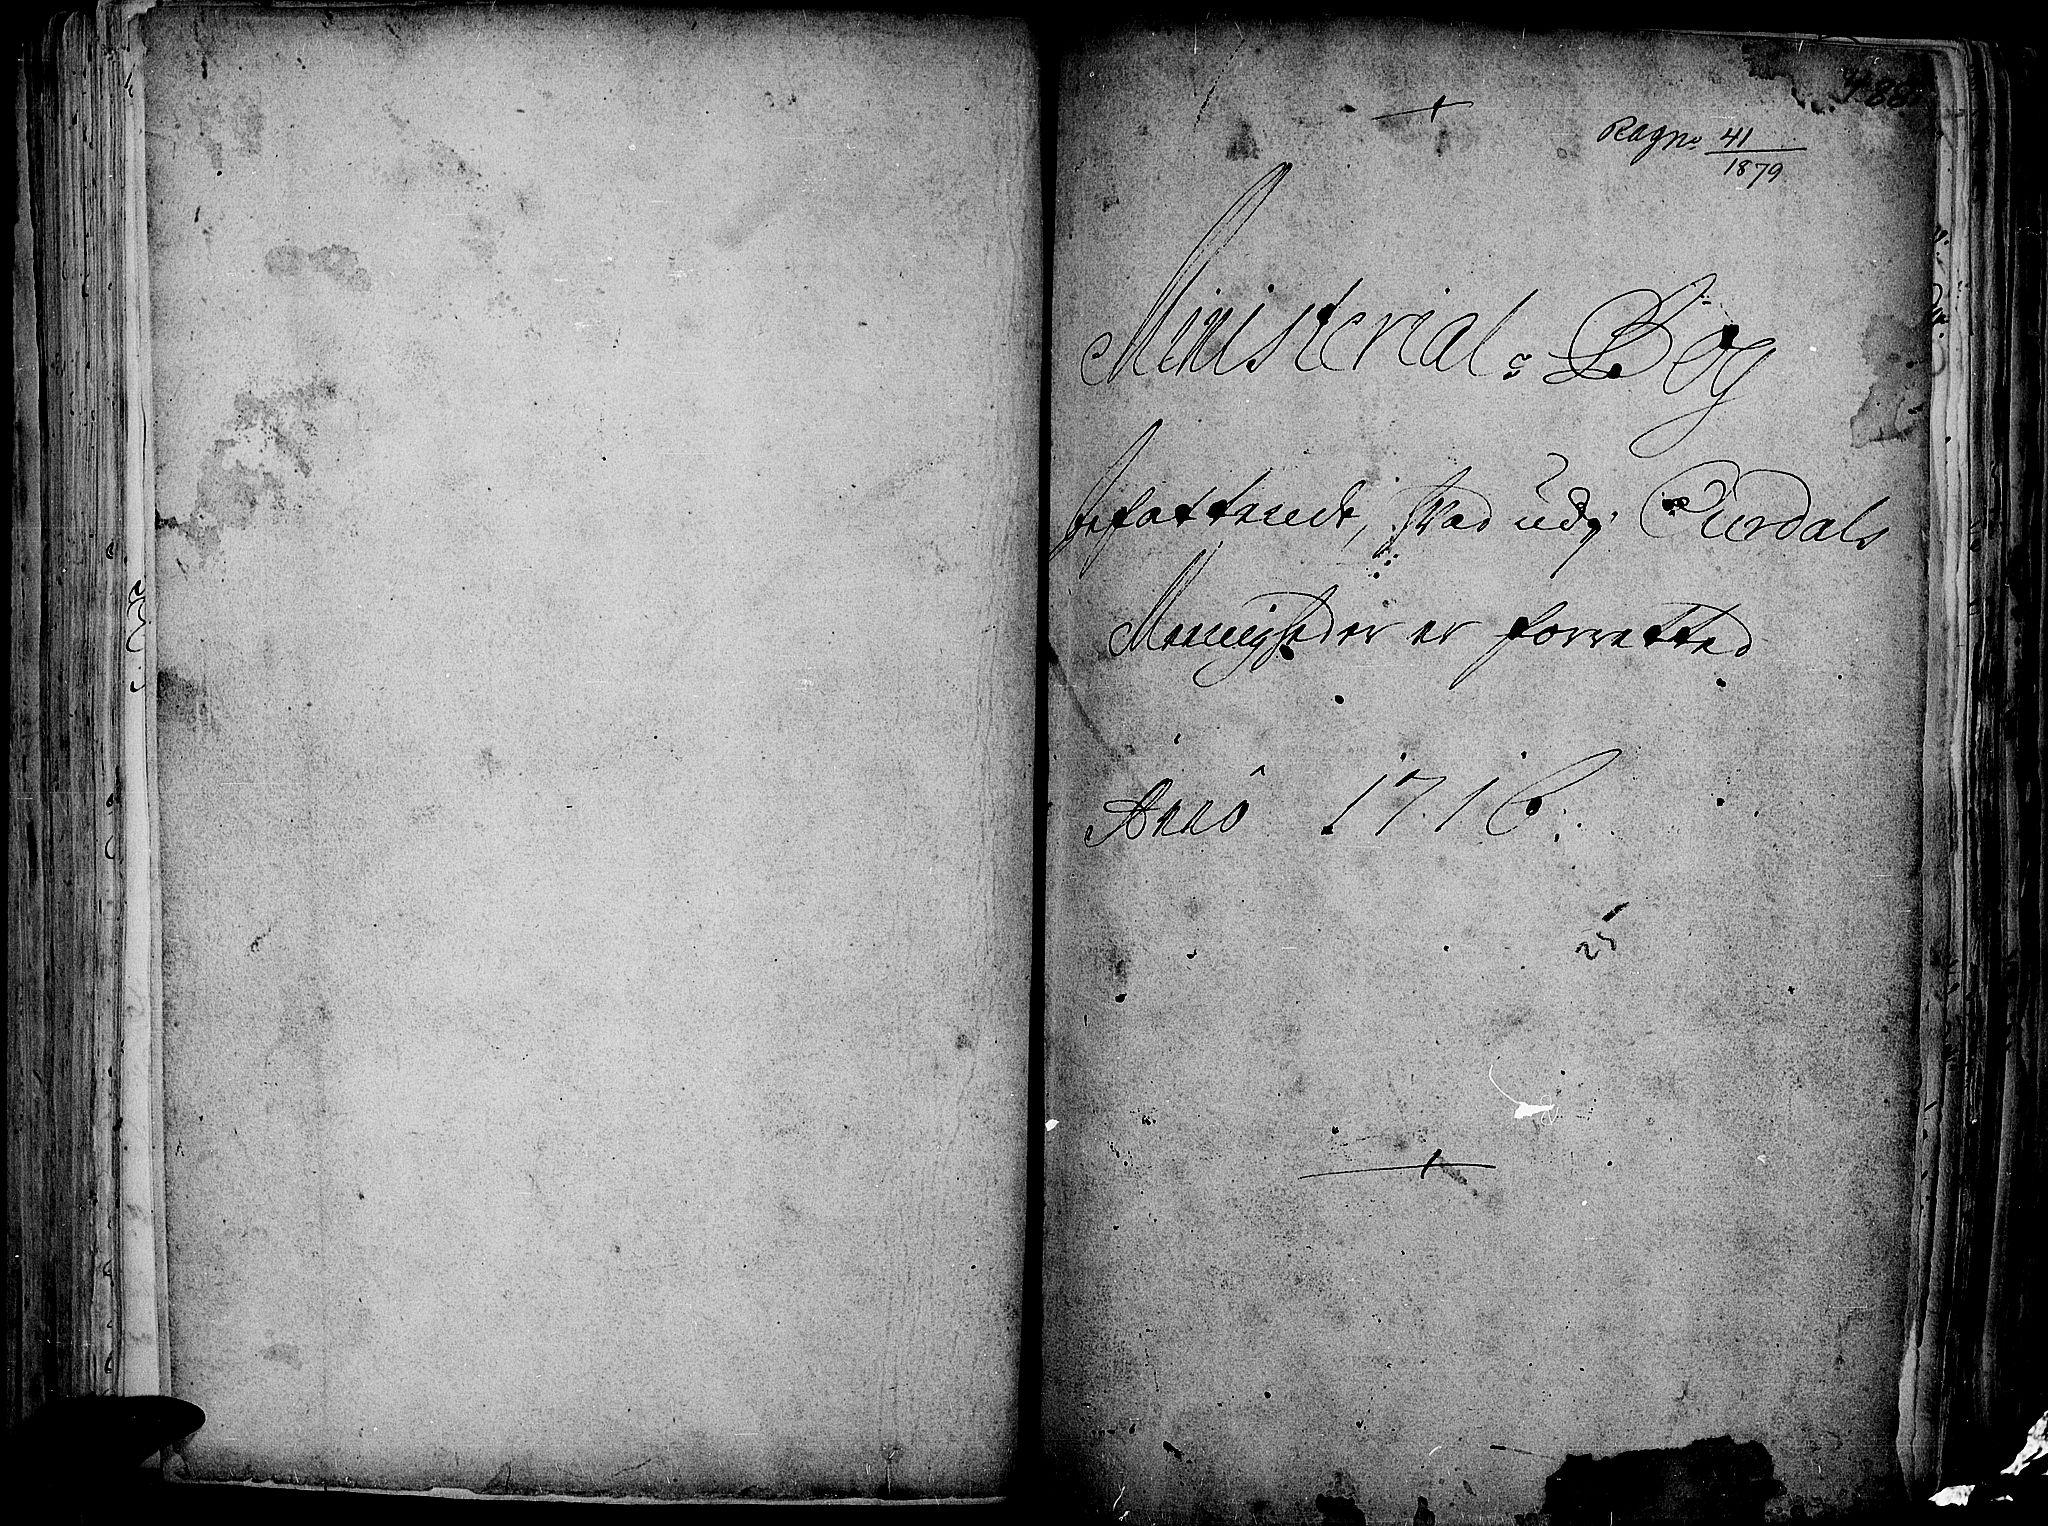 SAH, Aurdal prestekontor, Ministerialbok nr. 1-3, 1692-1730, s. 485